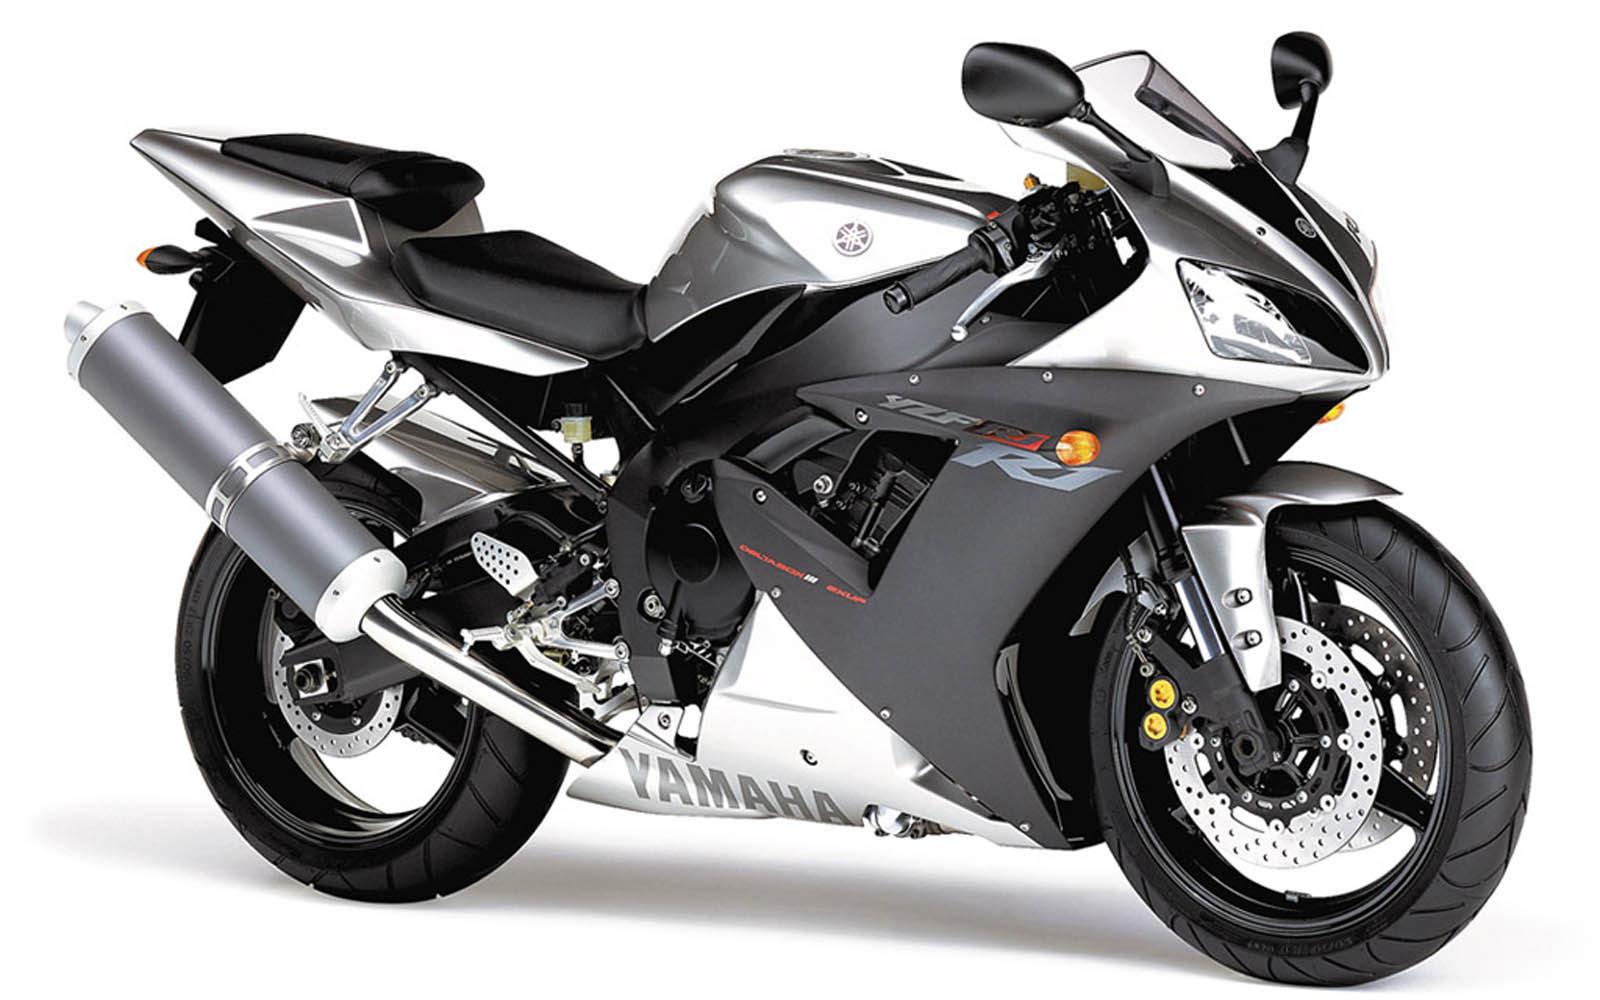 r1 motorcycle wallpapers yamaha r1 motorcycle desktop wallpapers 1600x1000